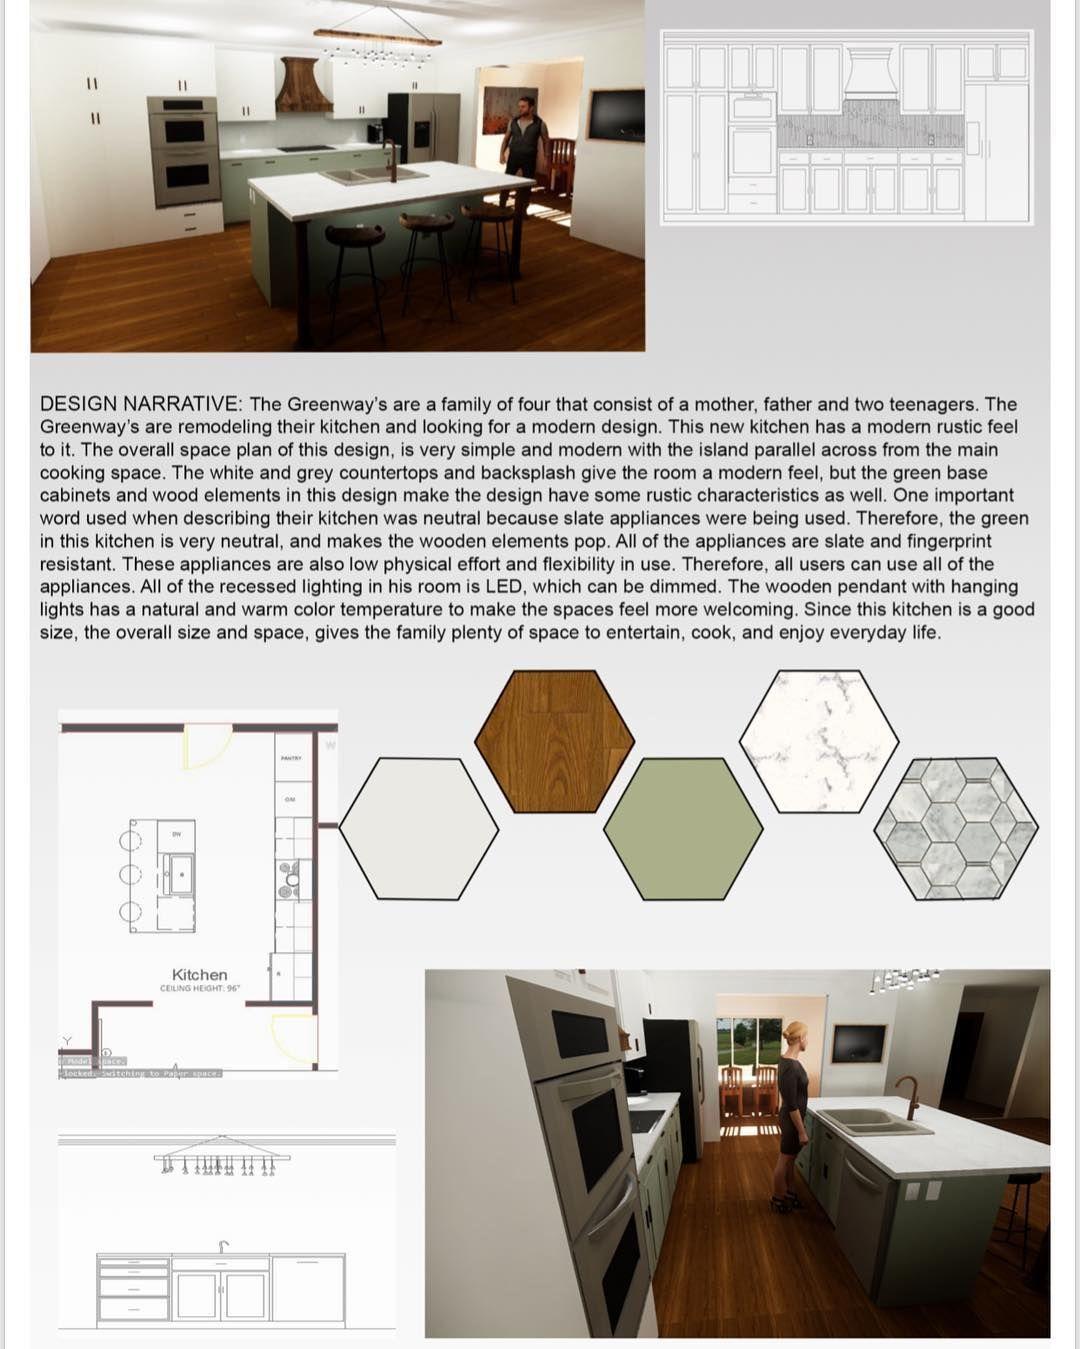 kitchen and bath • presentation board • made in photoshop #kitchen